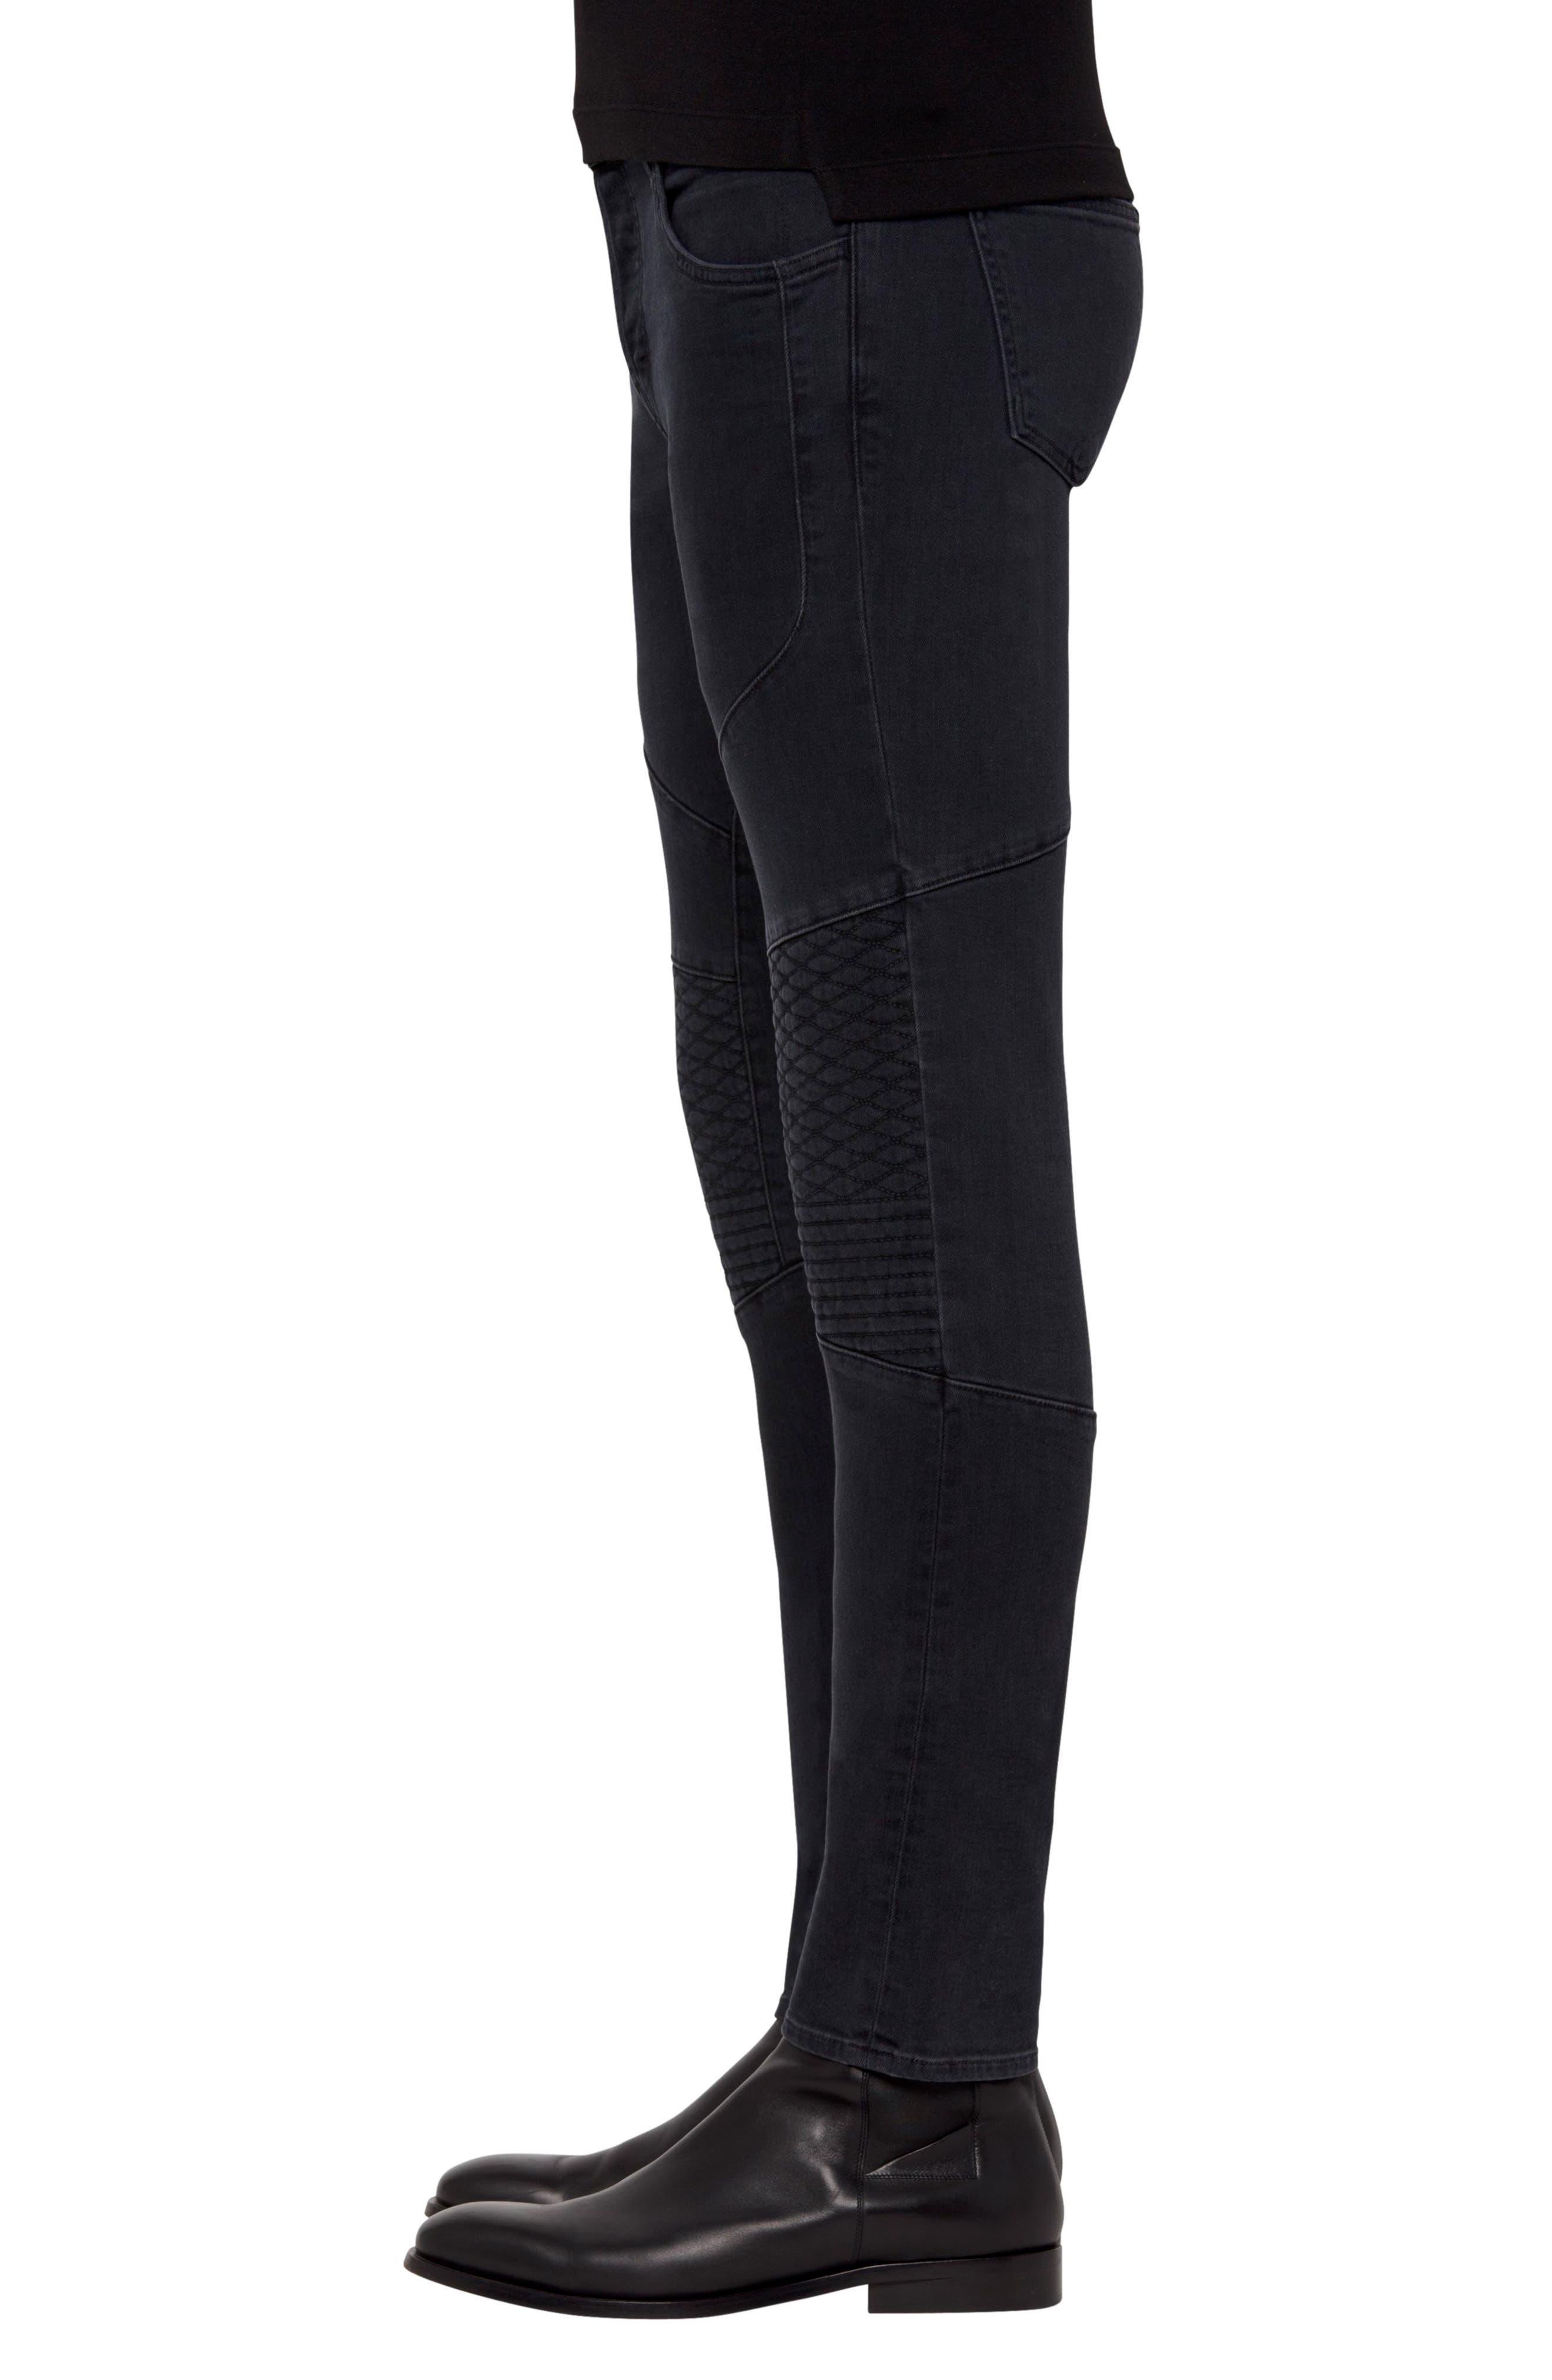 Bearden Moto Skinny Fit Jeans,                             Alternate thumbnail 3, color,                             002